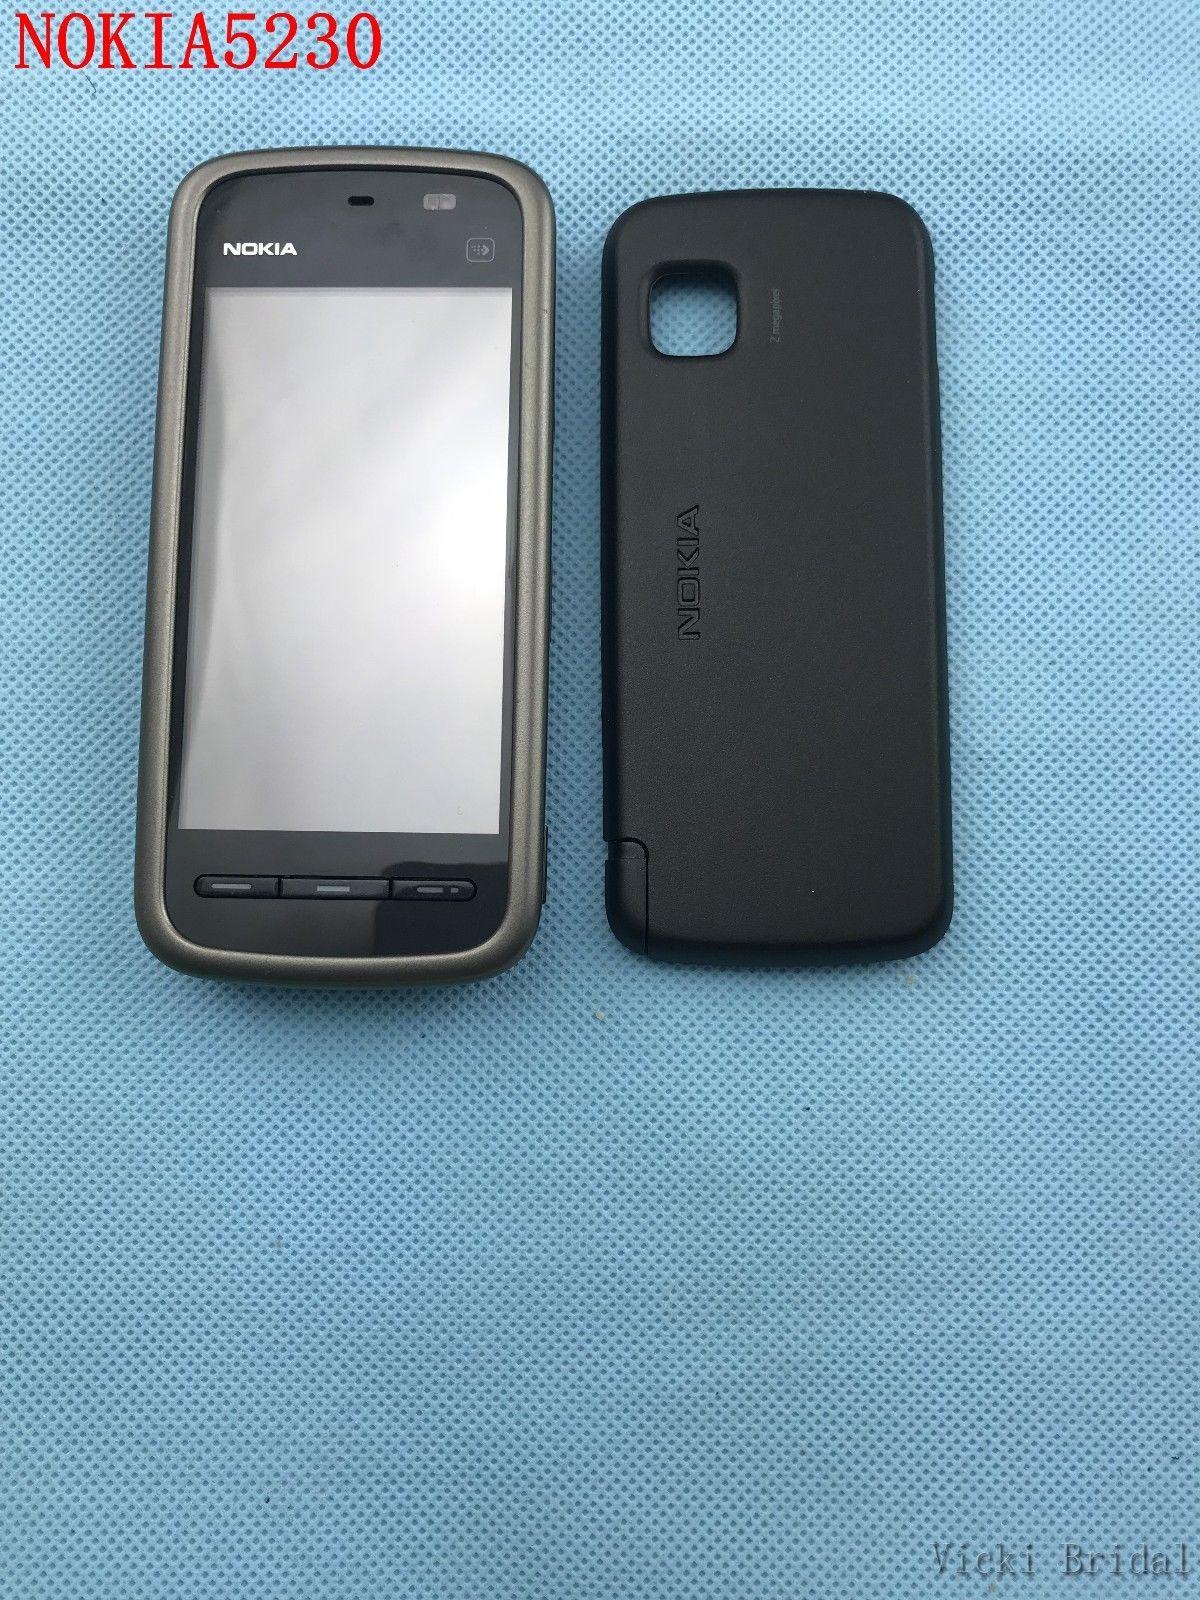 "Refurbished smartphone Nokia 5230 GPS 3G 3.2"" Bluetooth JAVA 2MP Unlocked Mobile Phone white 12"